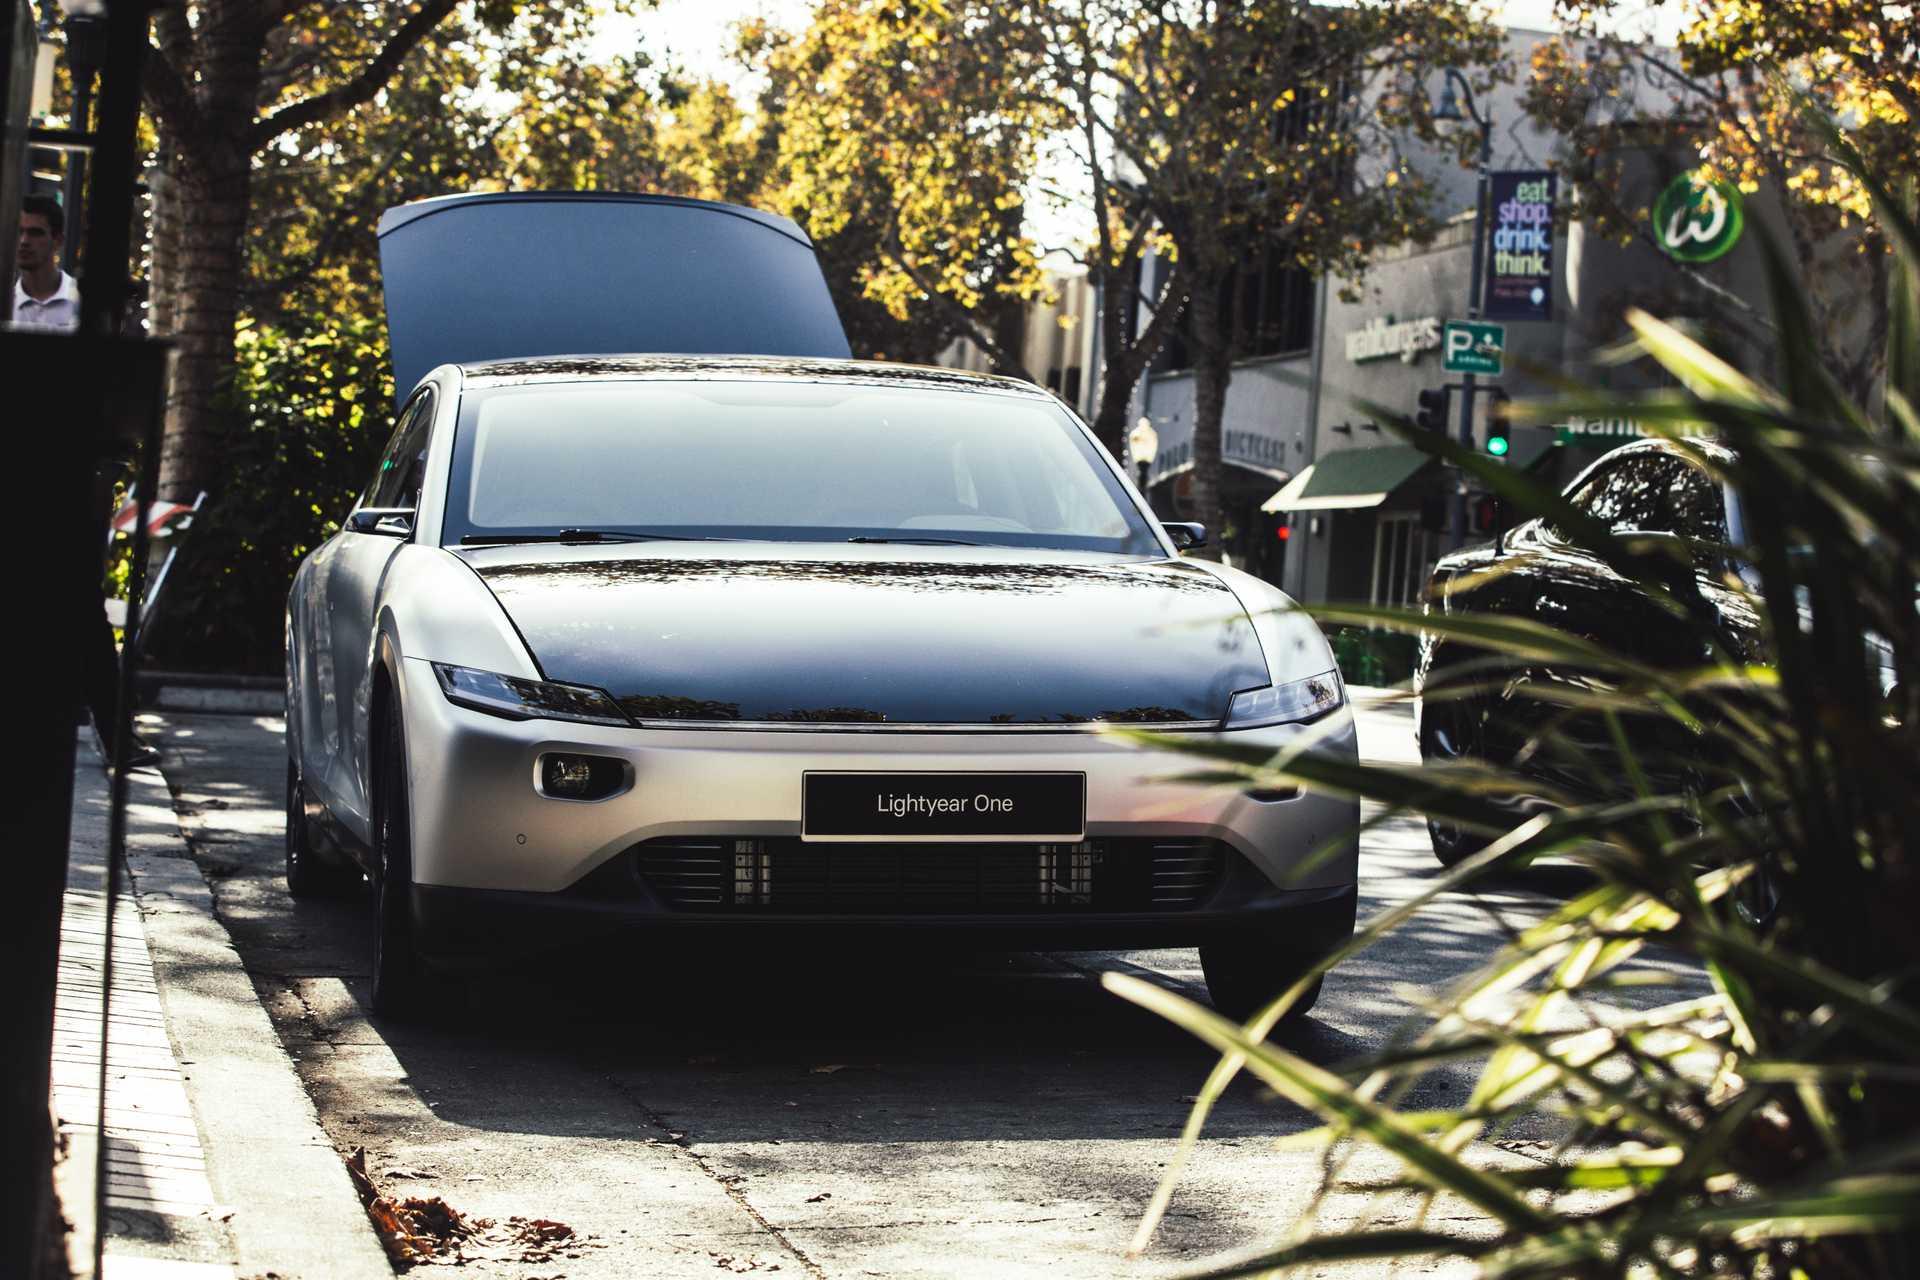 Lightyear One solar electric vehicle